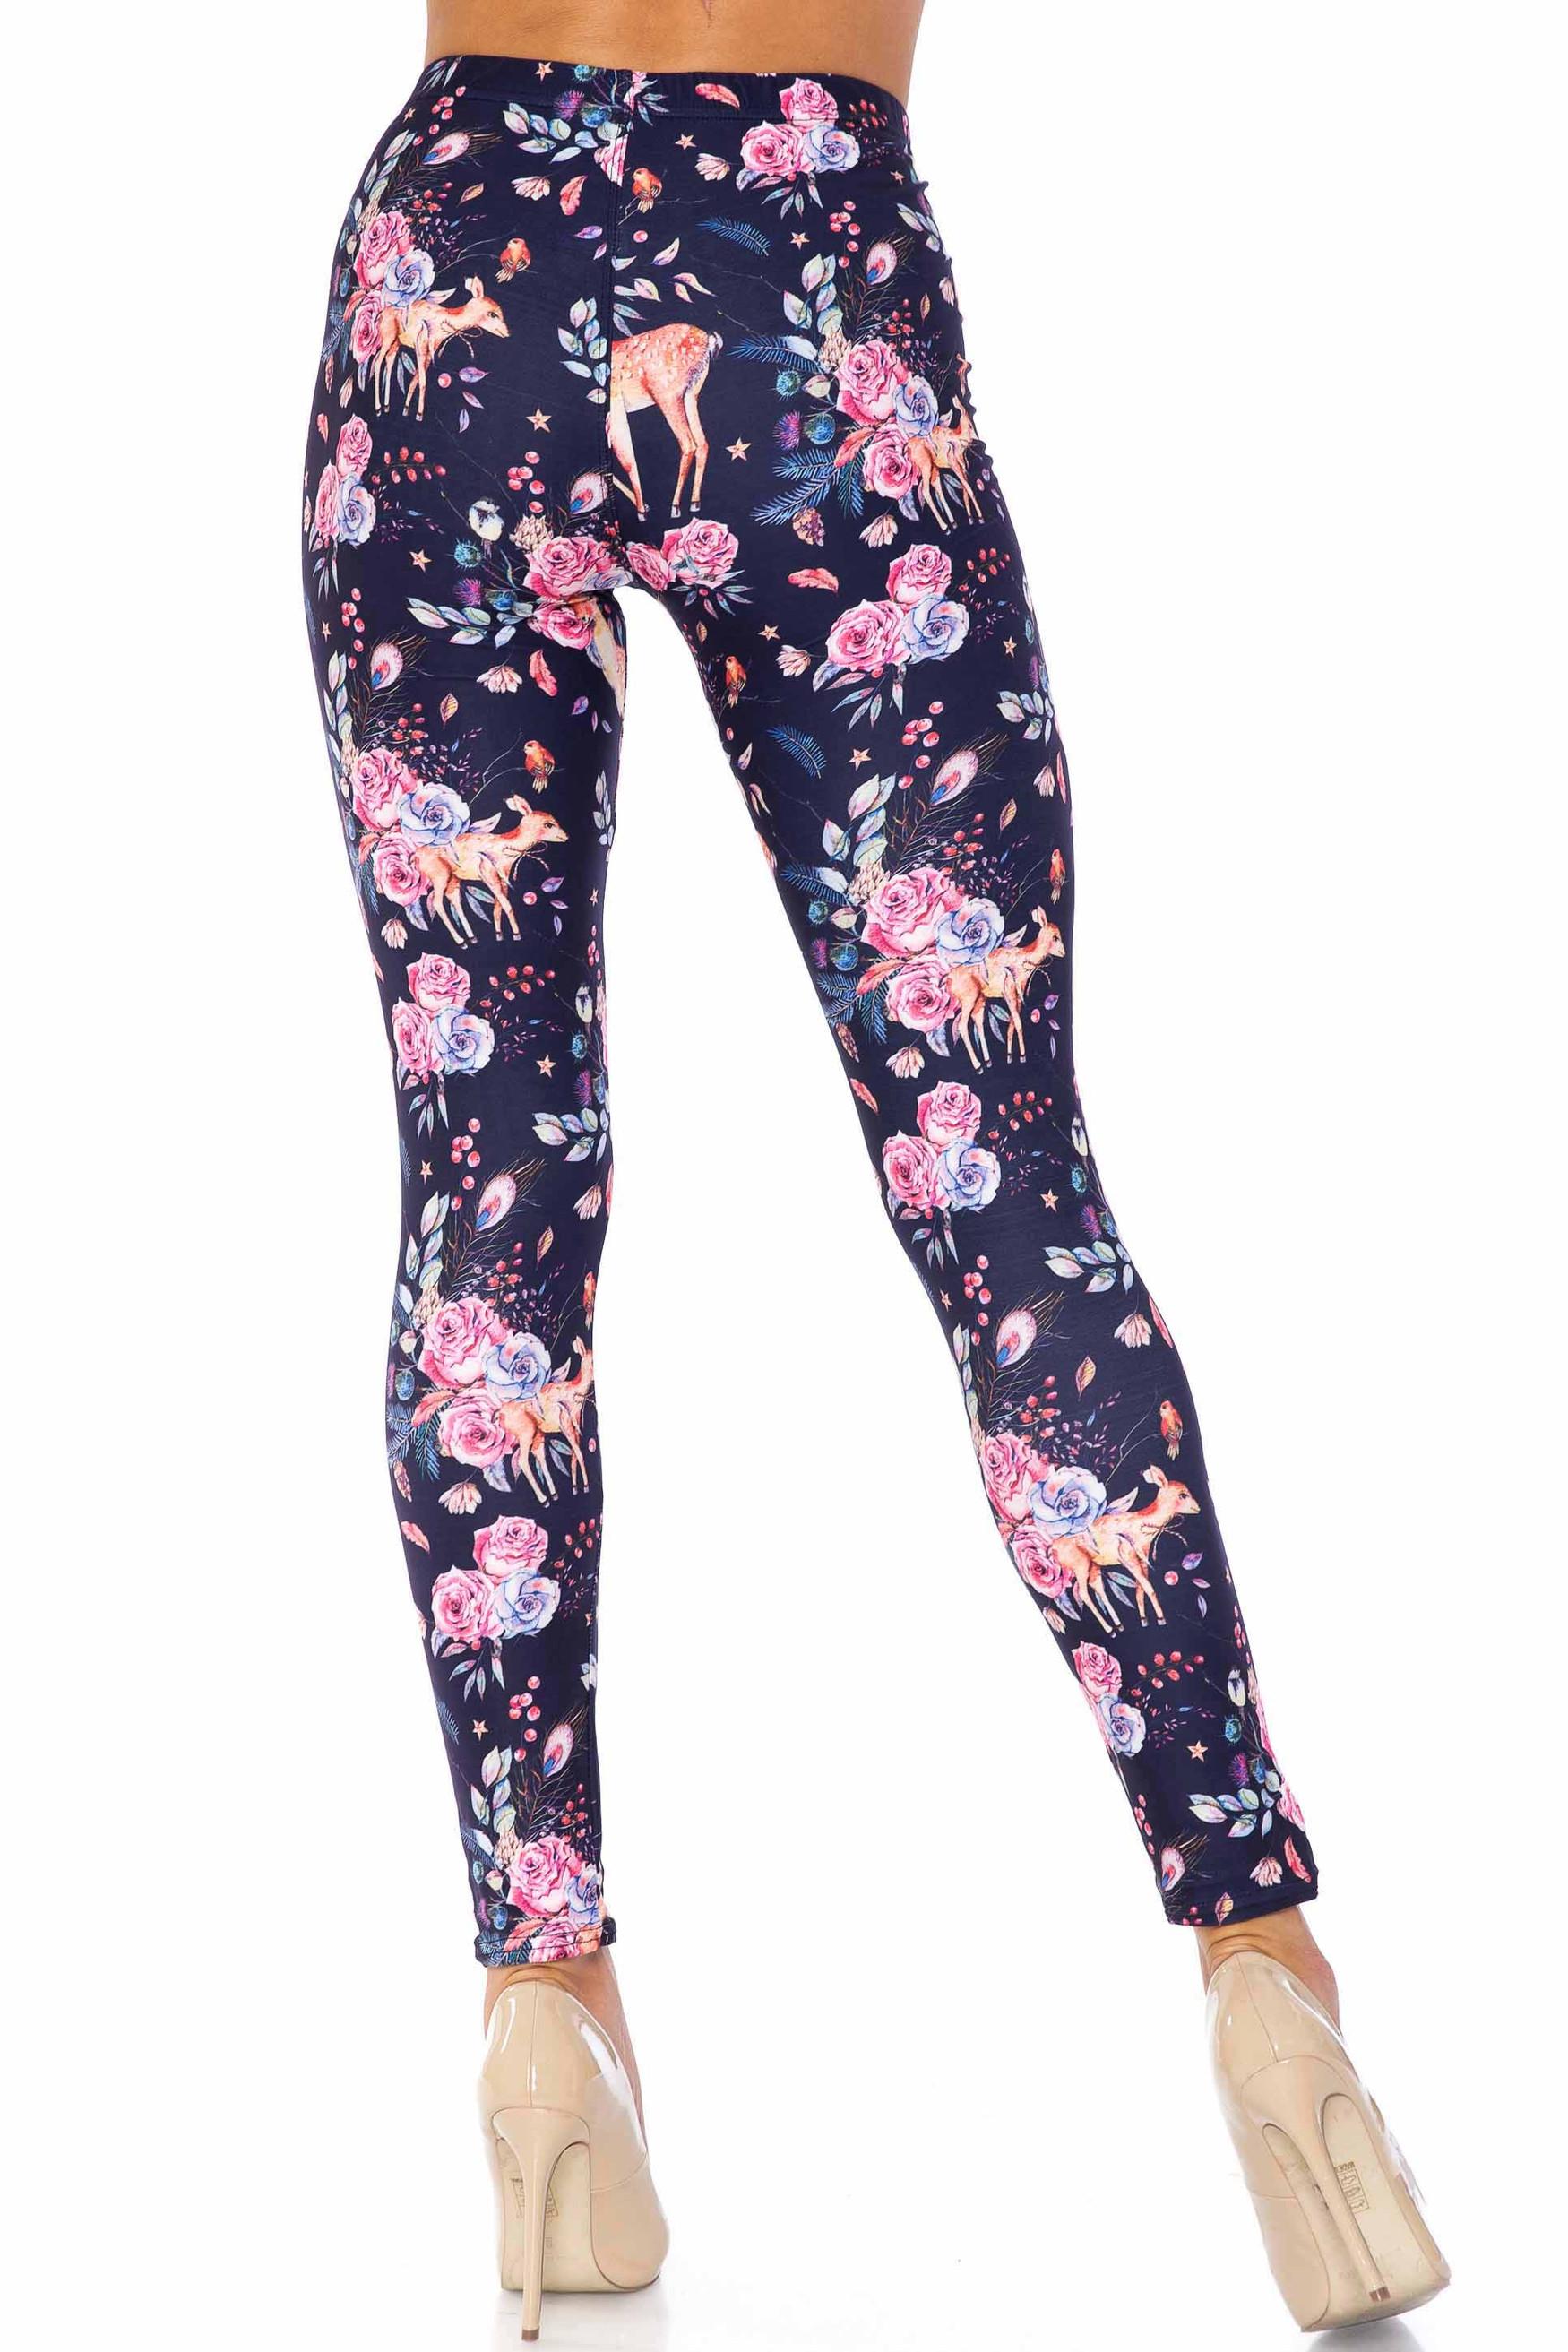 Creamy Soft Woodland Floral Fawn Kids Leggings - USA Fashion™